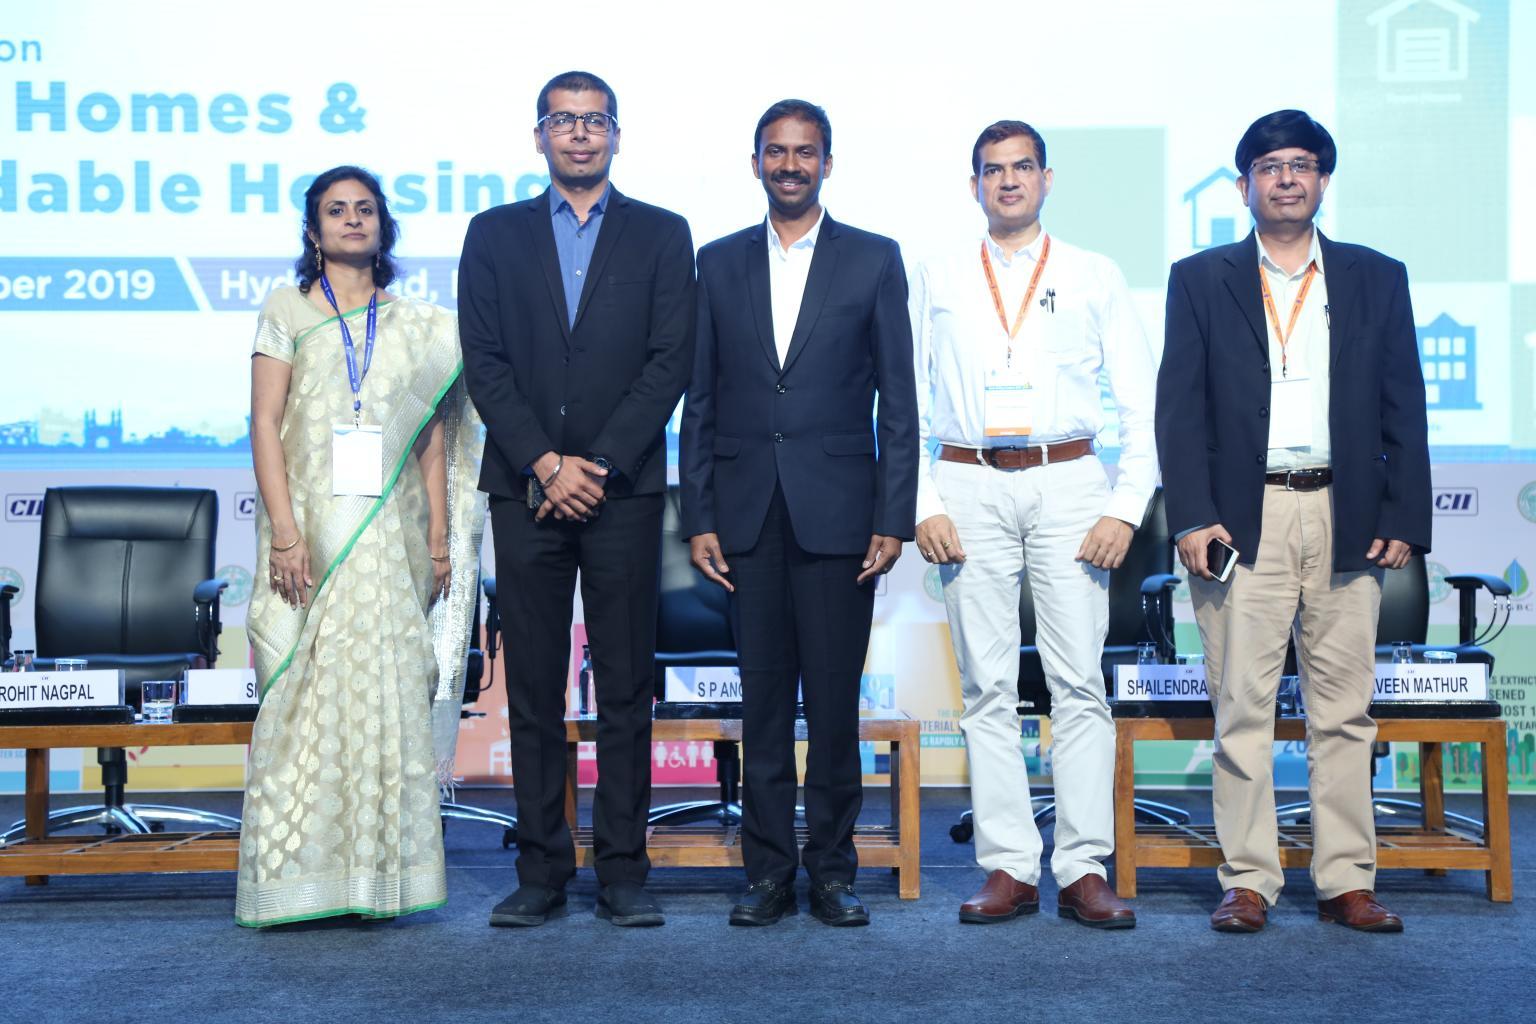 Green Building Congress 2019